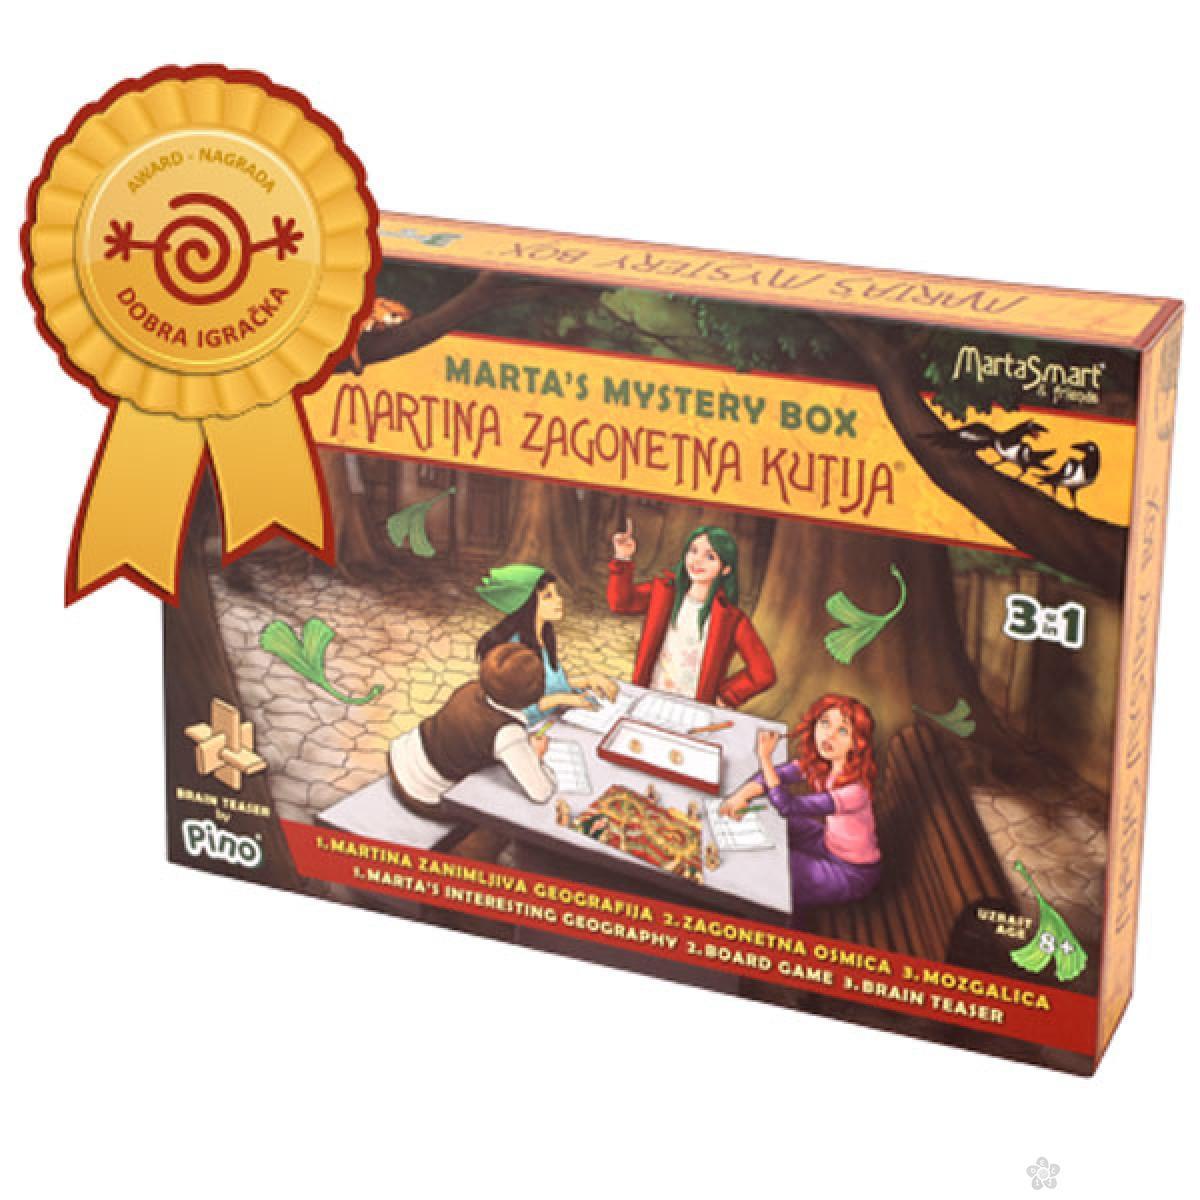 Društvena igra Martina zagonetna kutija, 8538